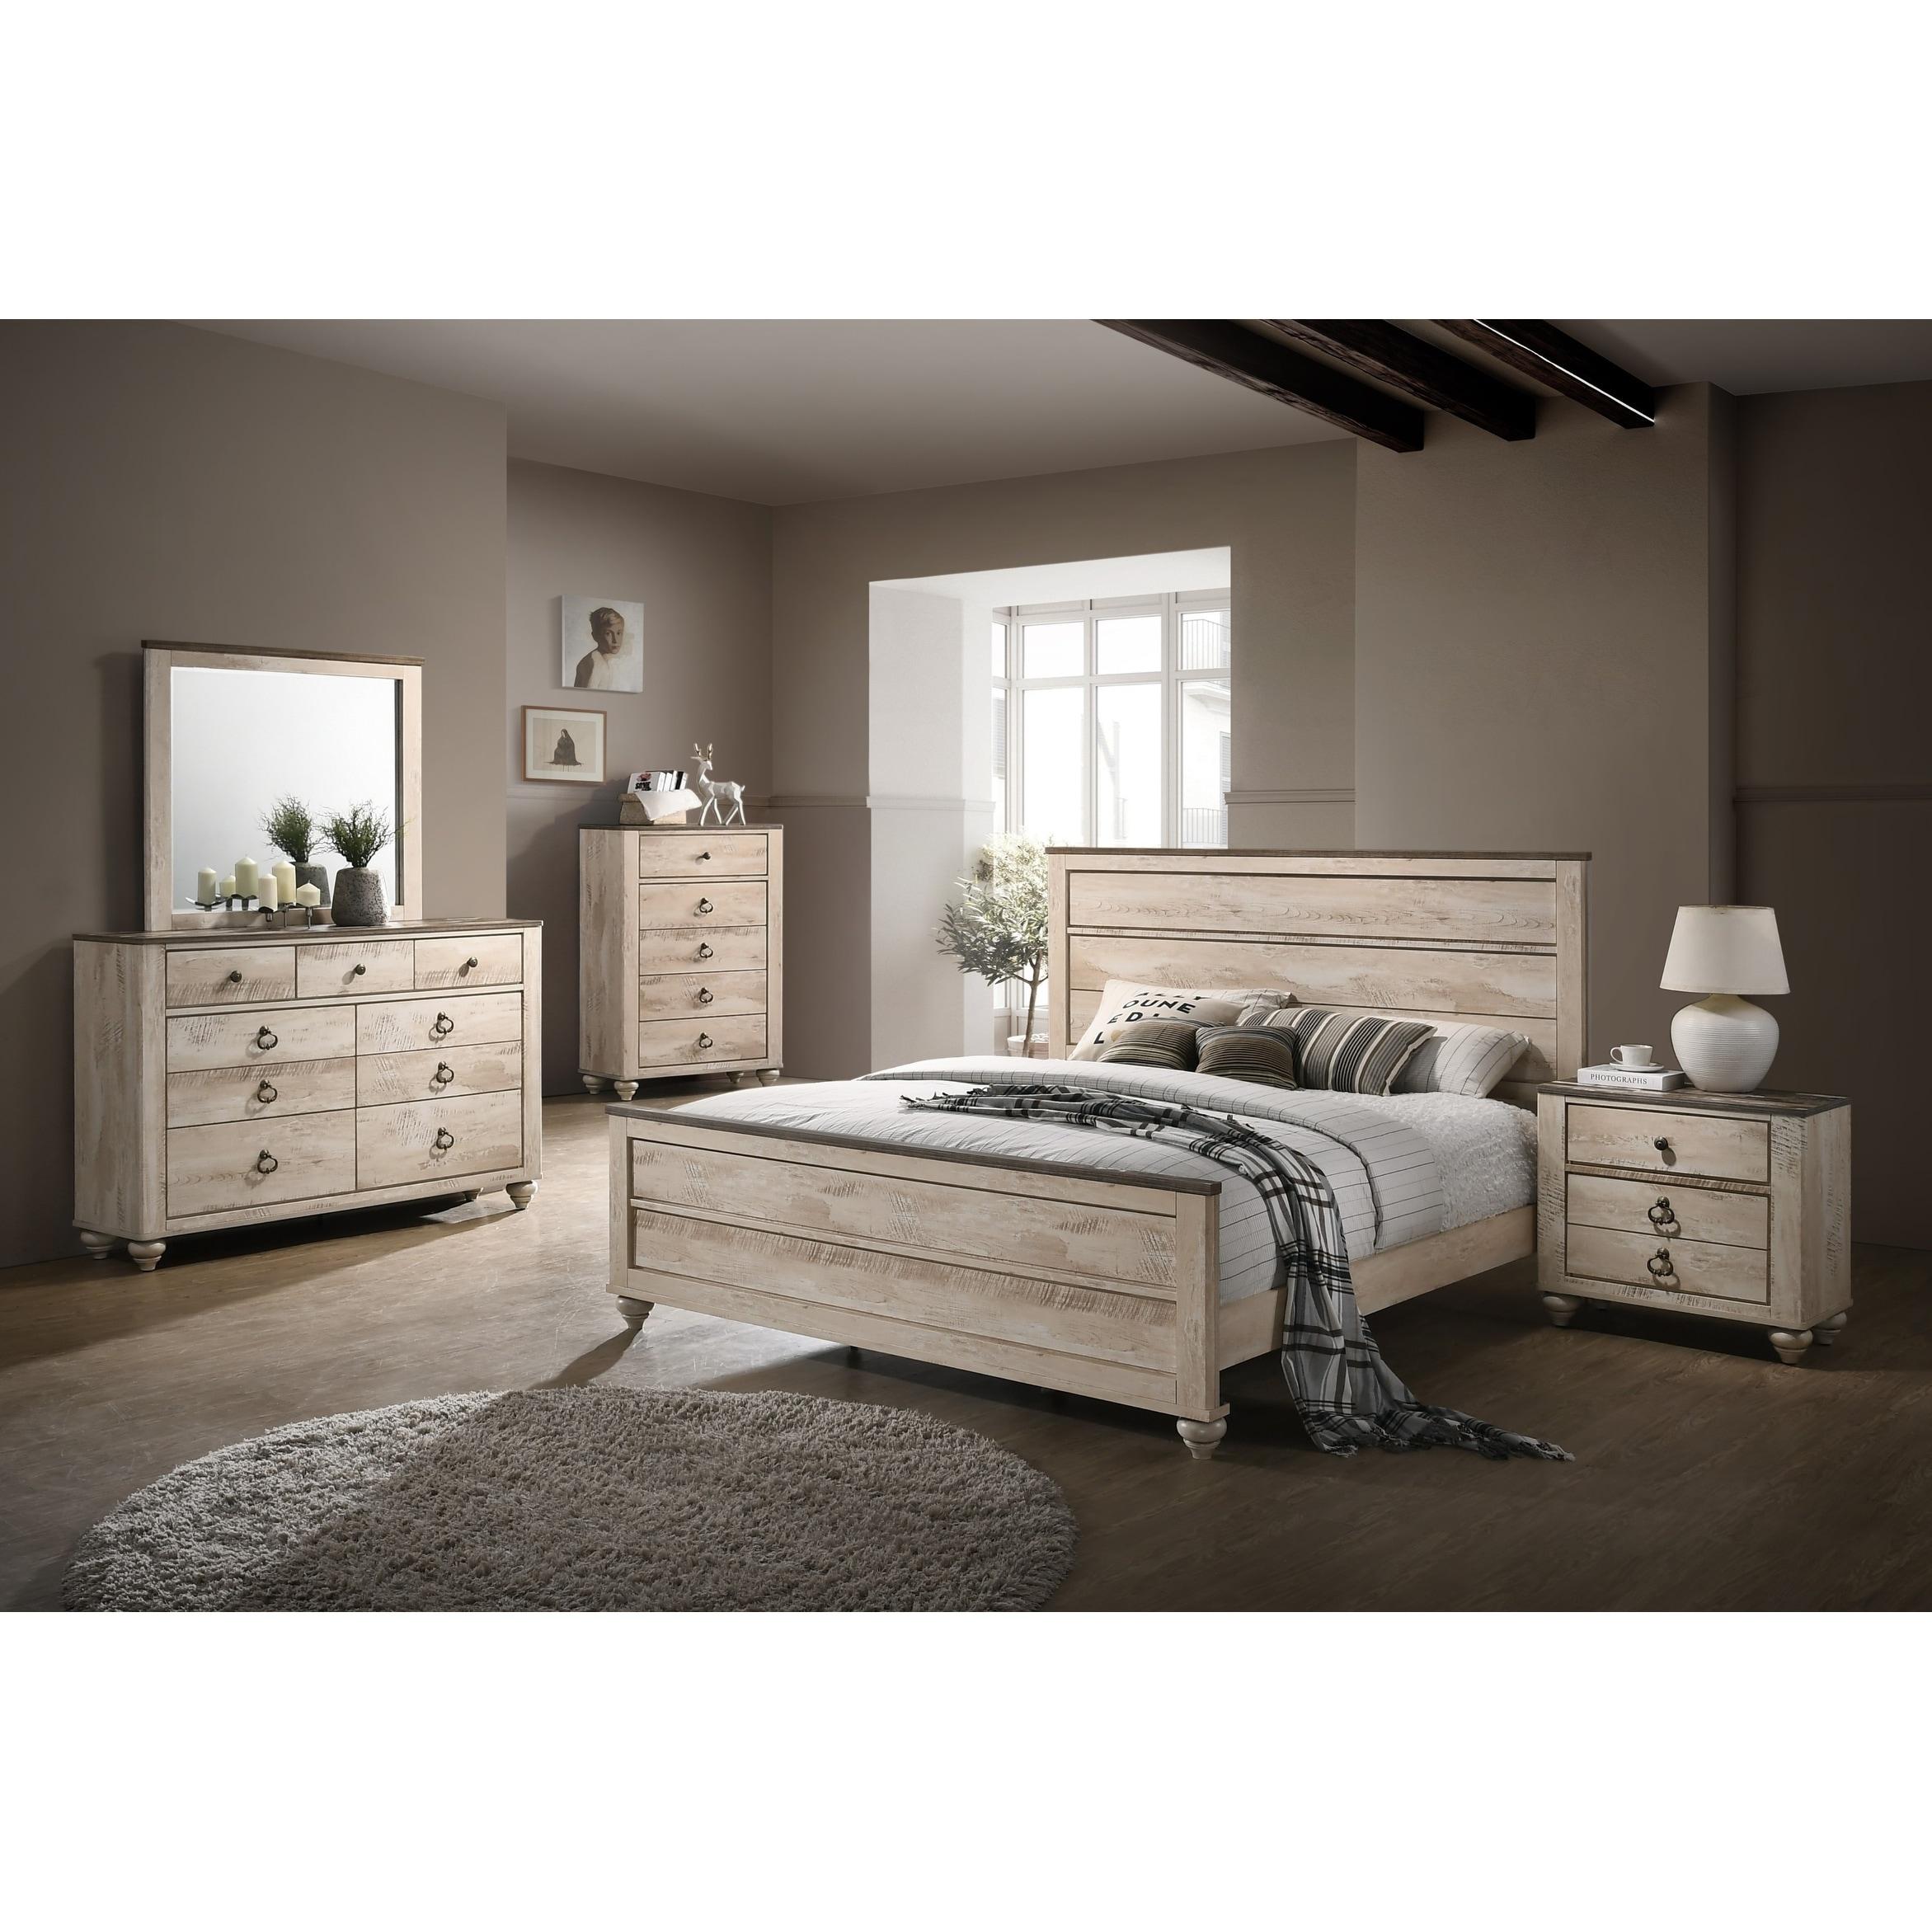 Imerland contemporary white wash finish 5 piece bedroom set king